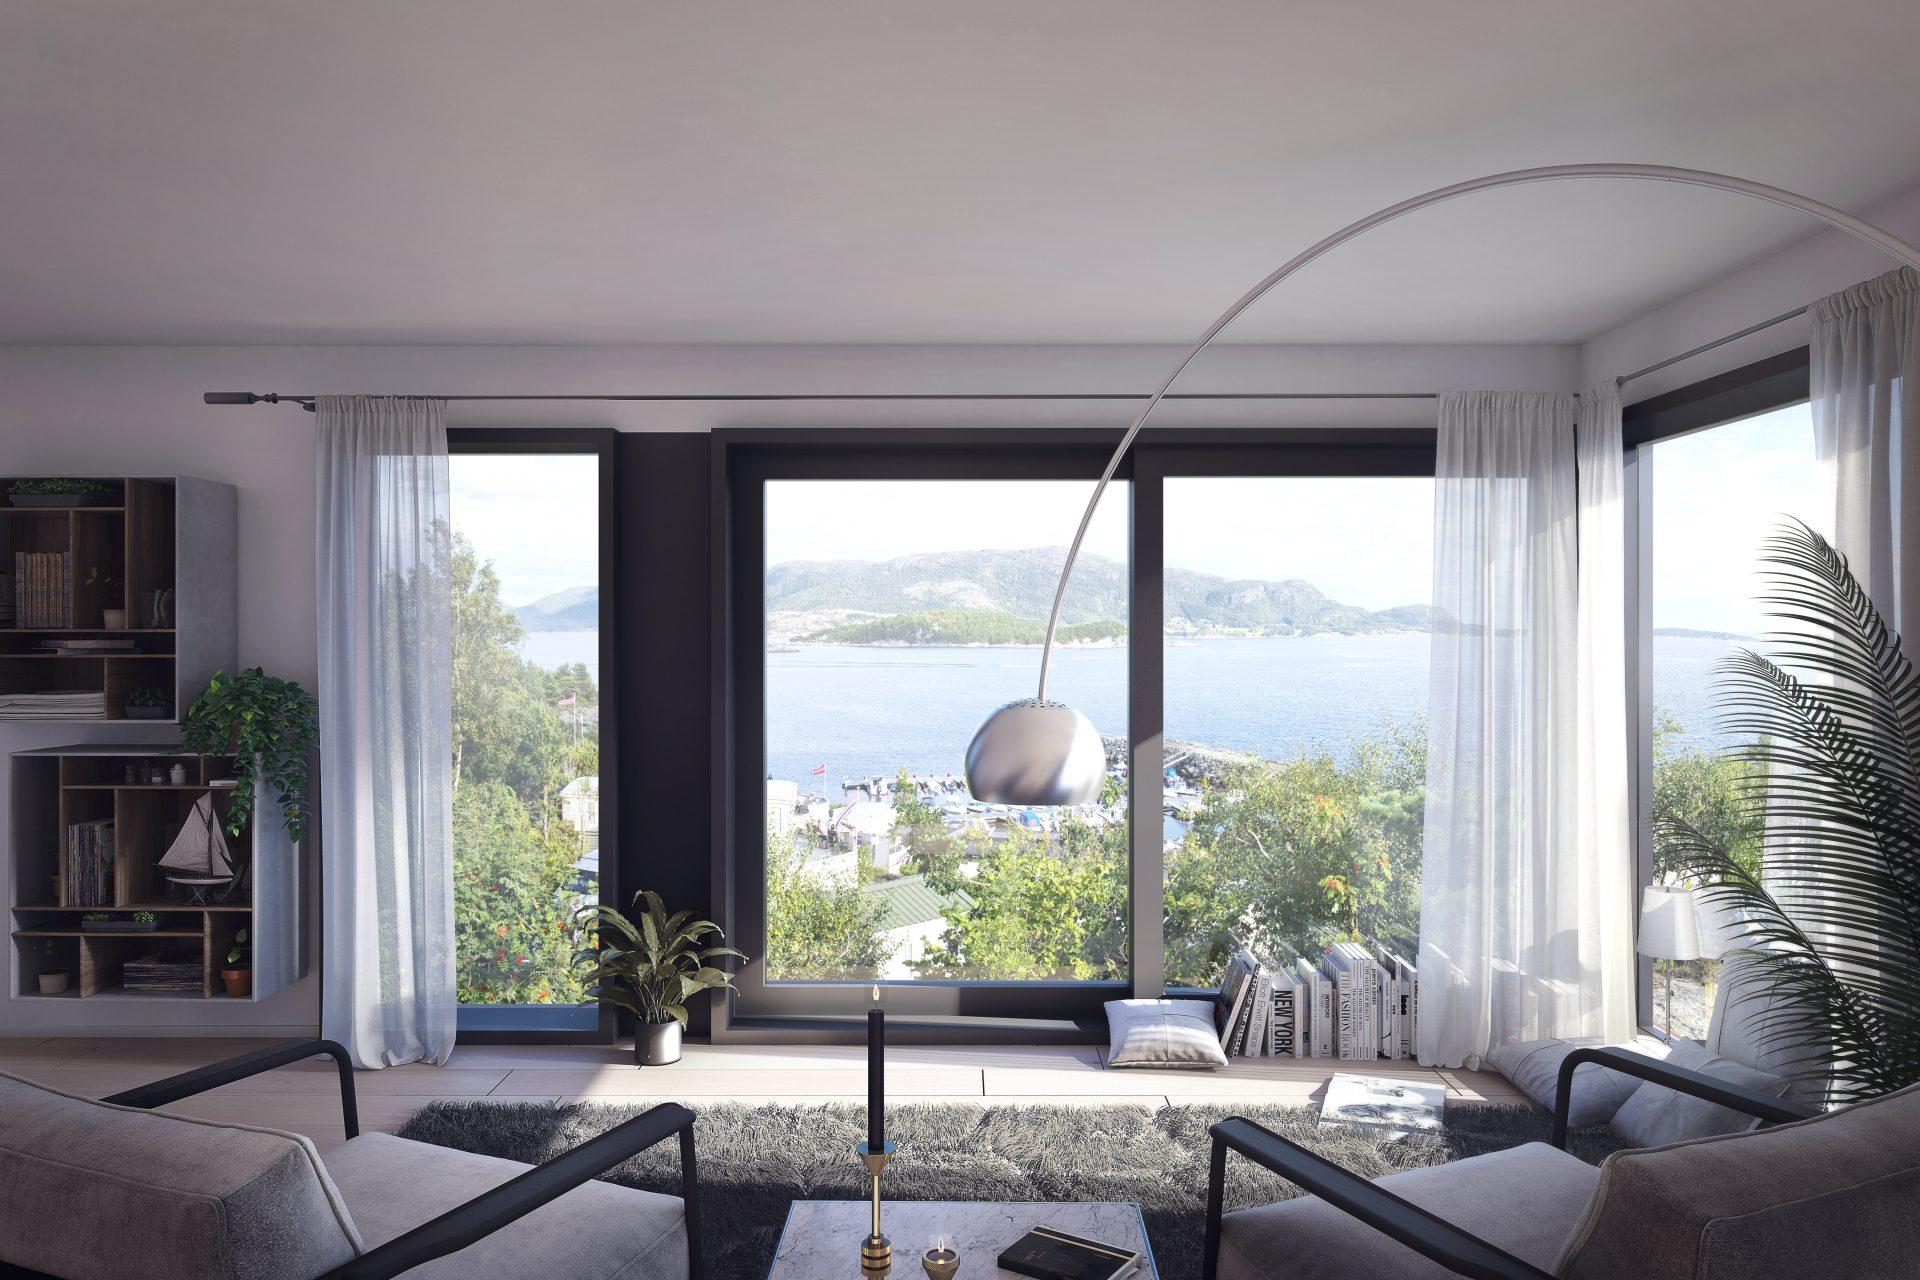 autvik_hervik_view06_interior_seafront-1920x1280.jpg